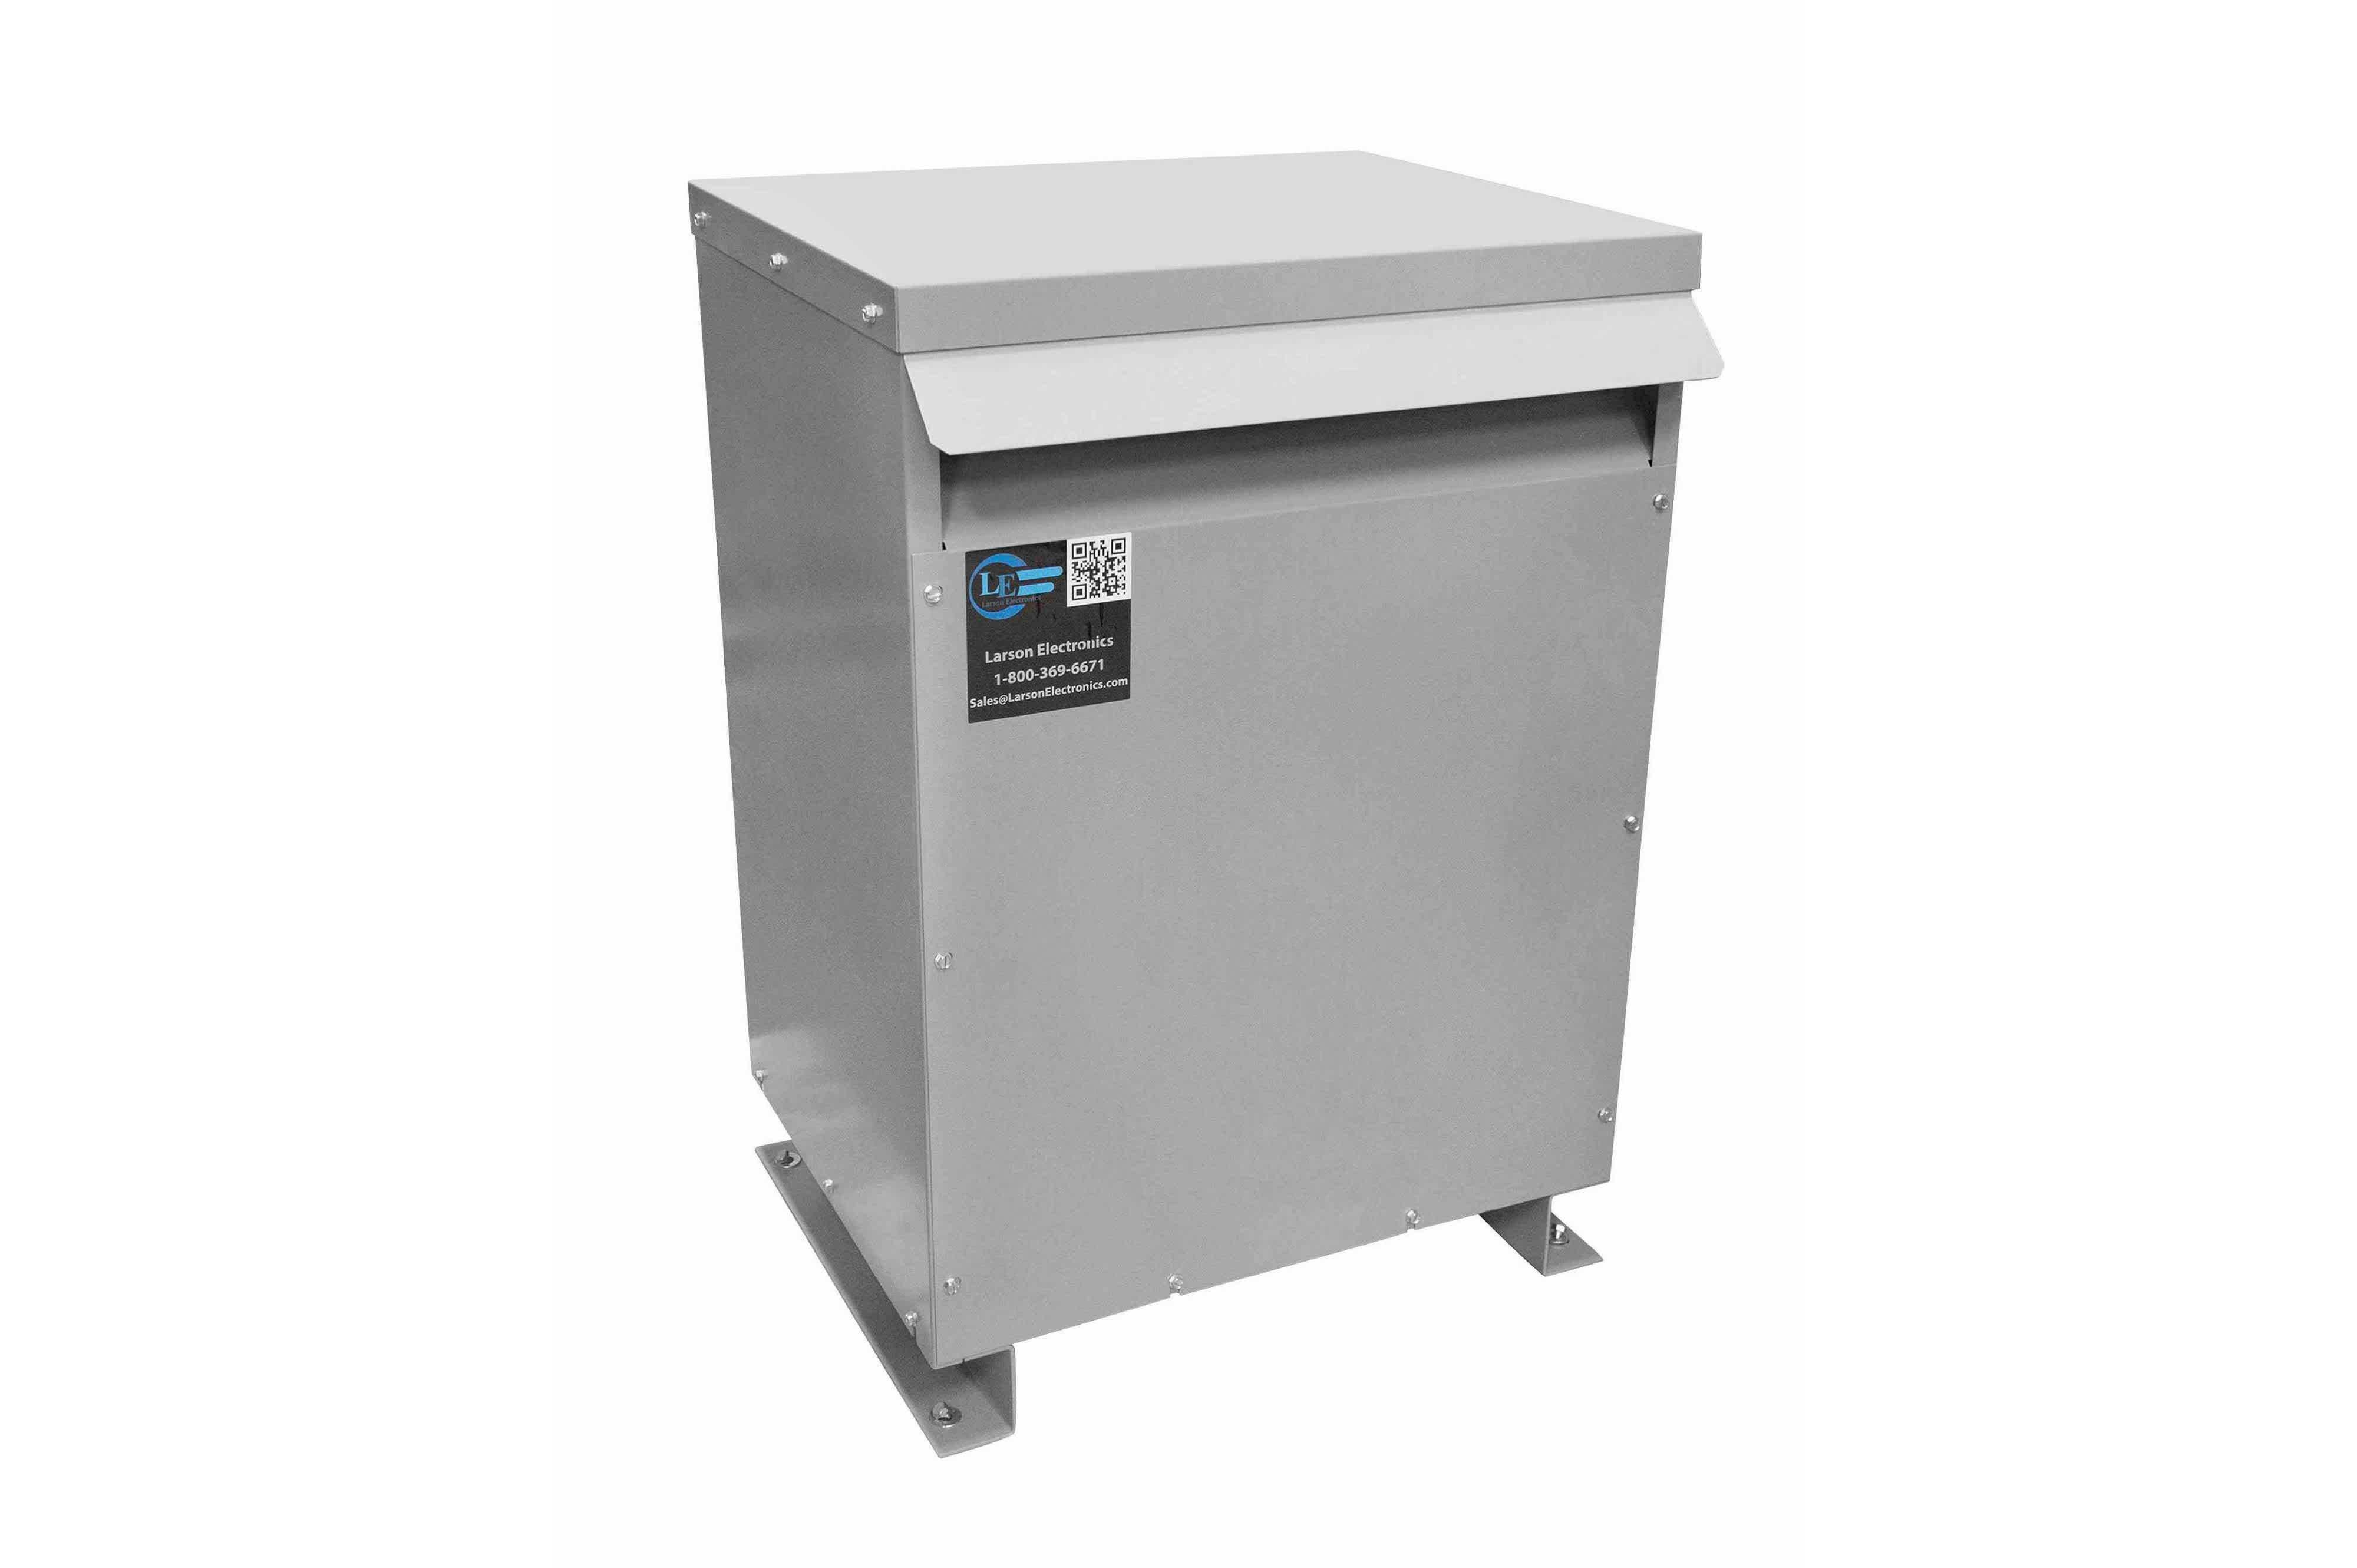 300 kVA 3PH Isolation Transformer, 240V Wye Primary, 380V Delta Secondary, N3R, Ventilated, 60 Hz